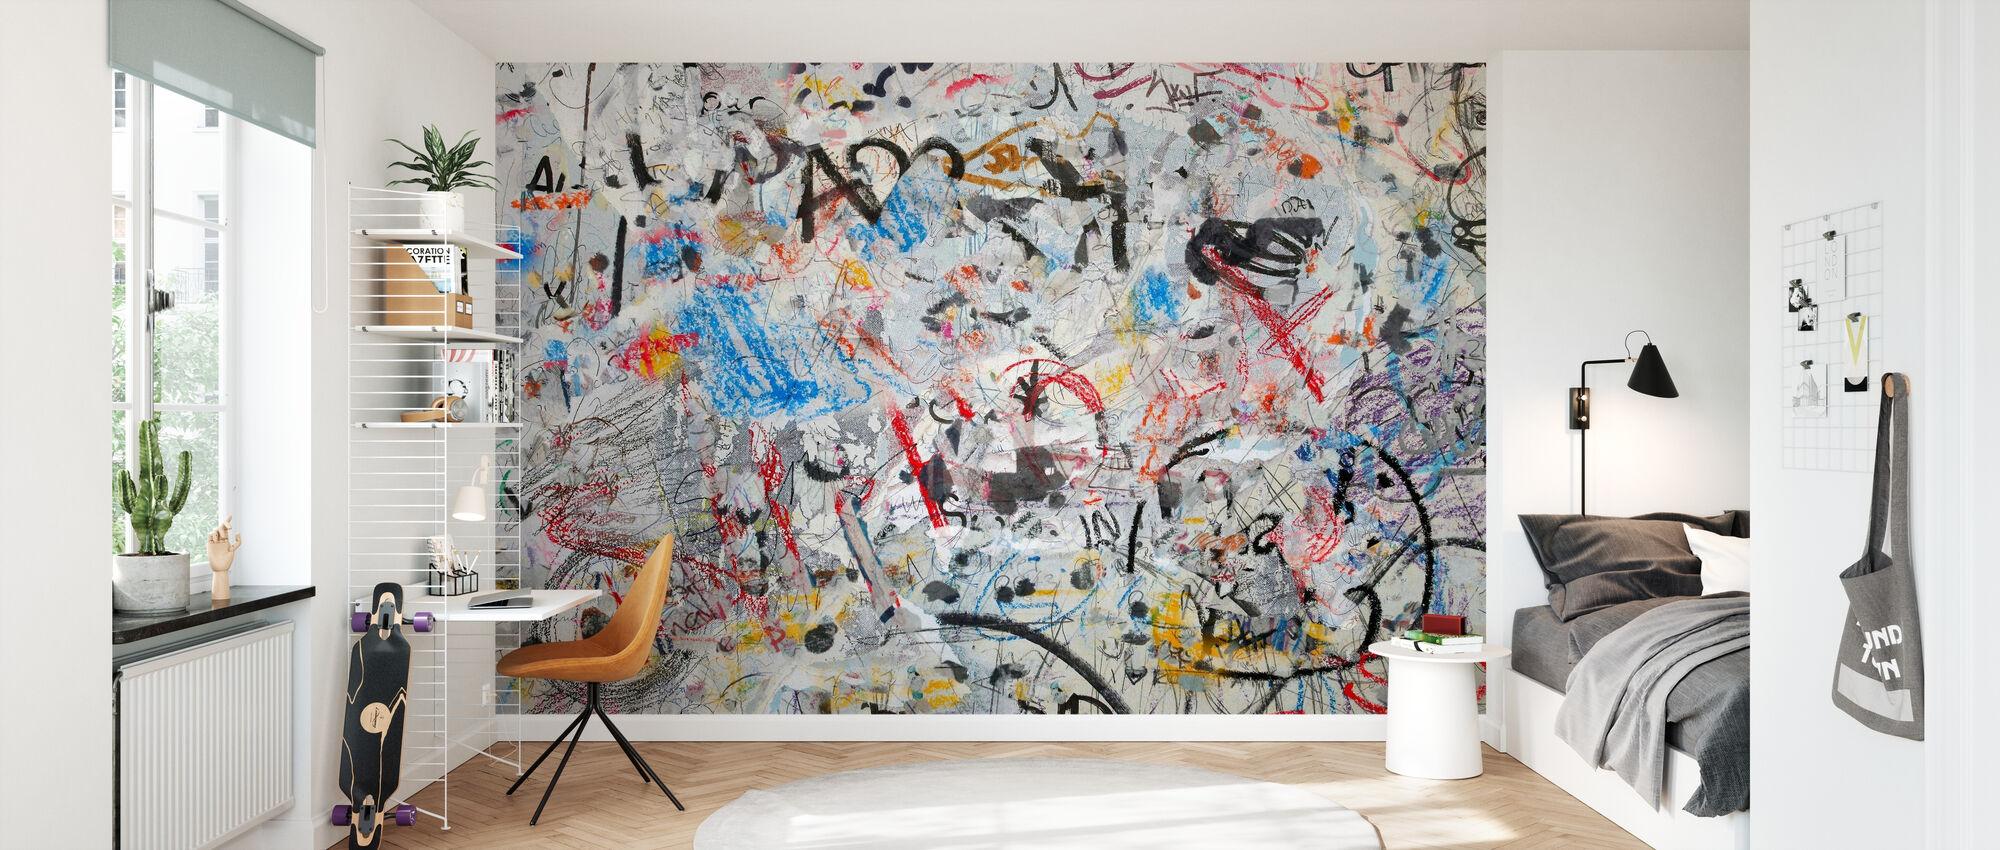 Grunge Graffiti Wall - Wallpaper - Kids Room